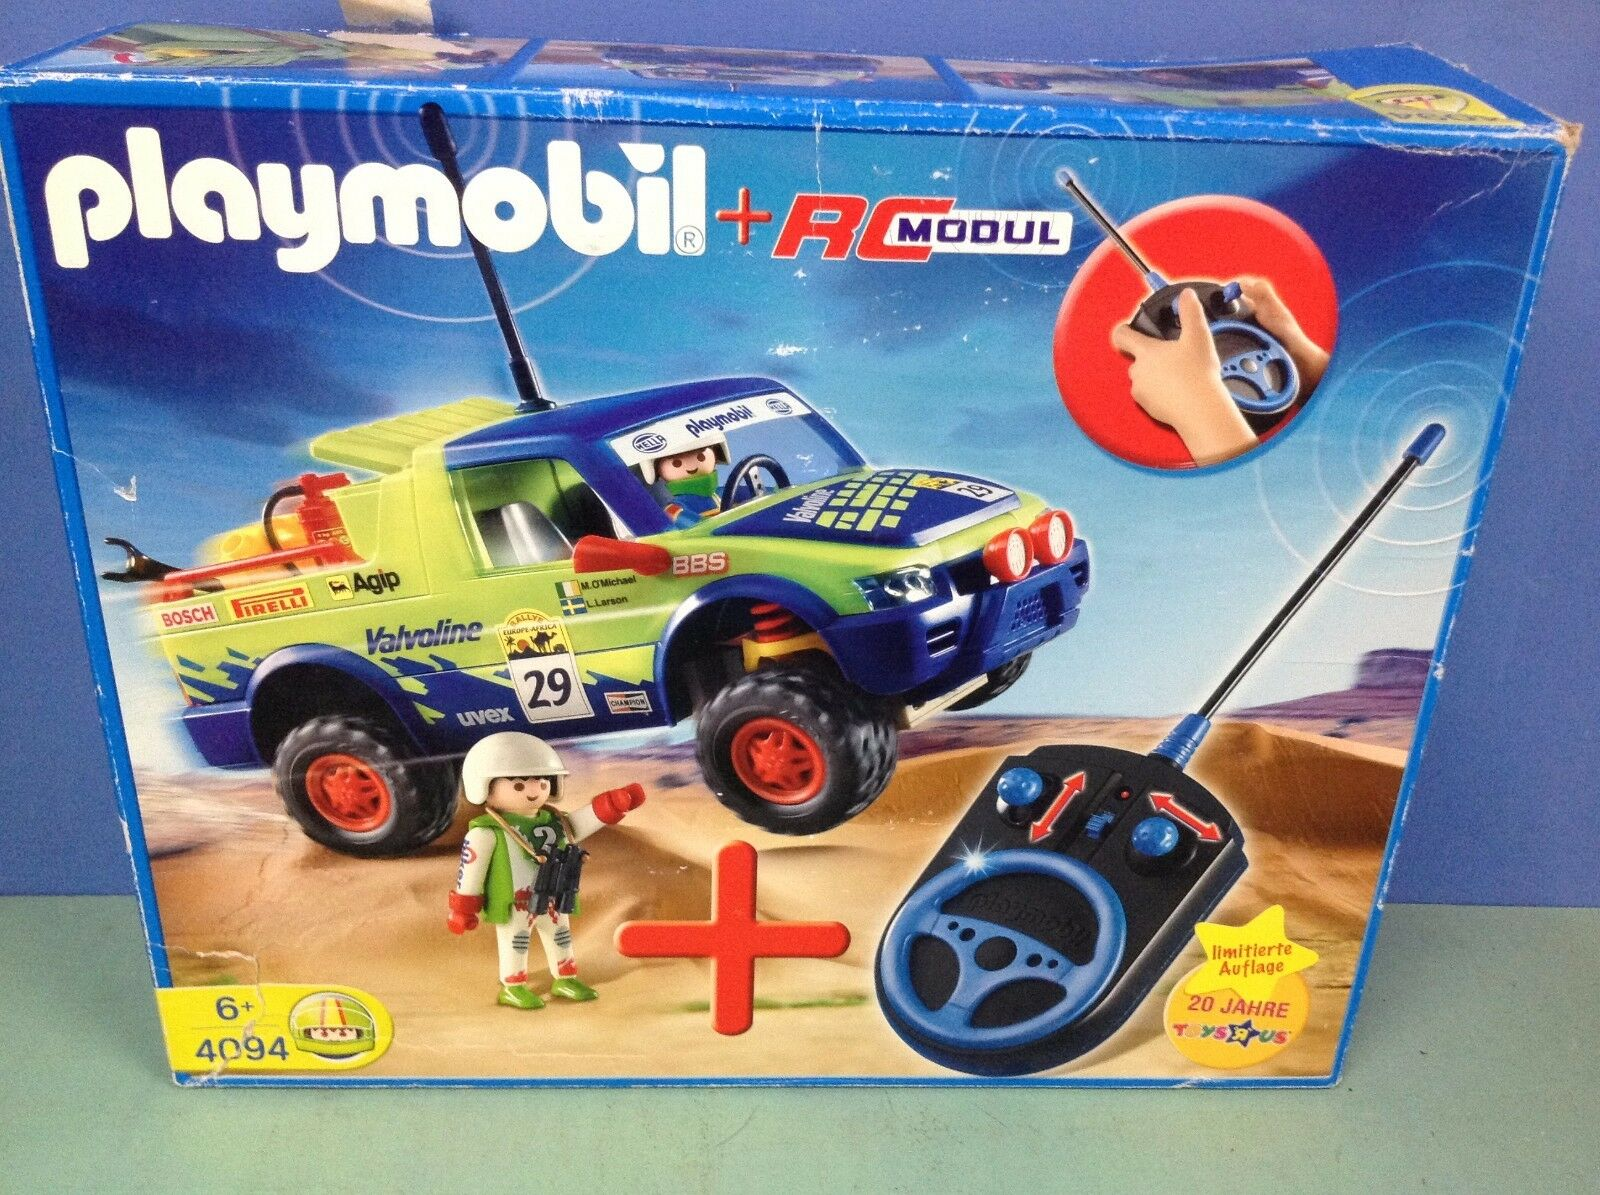 (O4094) playmobil Set exclusif 4x4 Paris Dakar + télécommande ref 4094 en boite